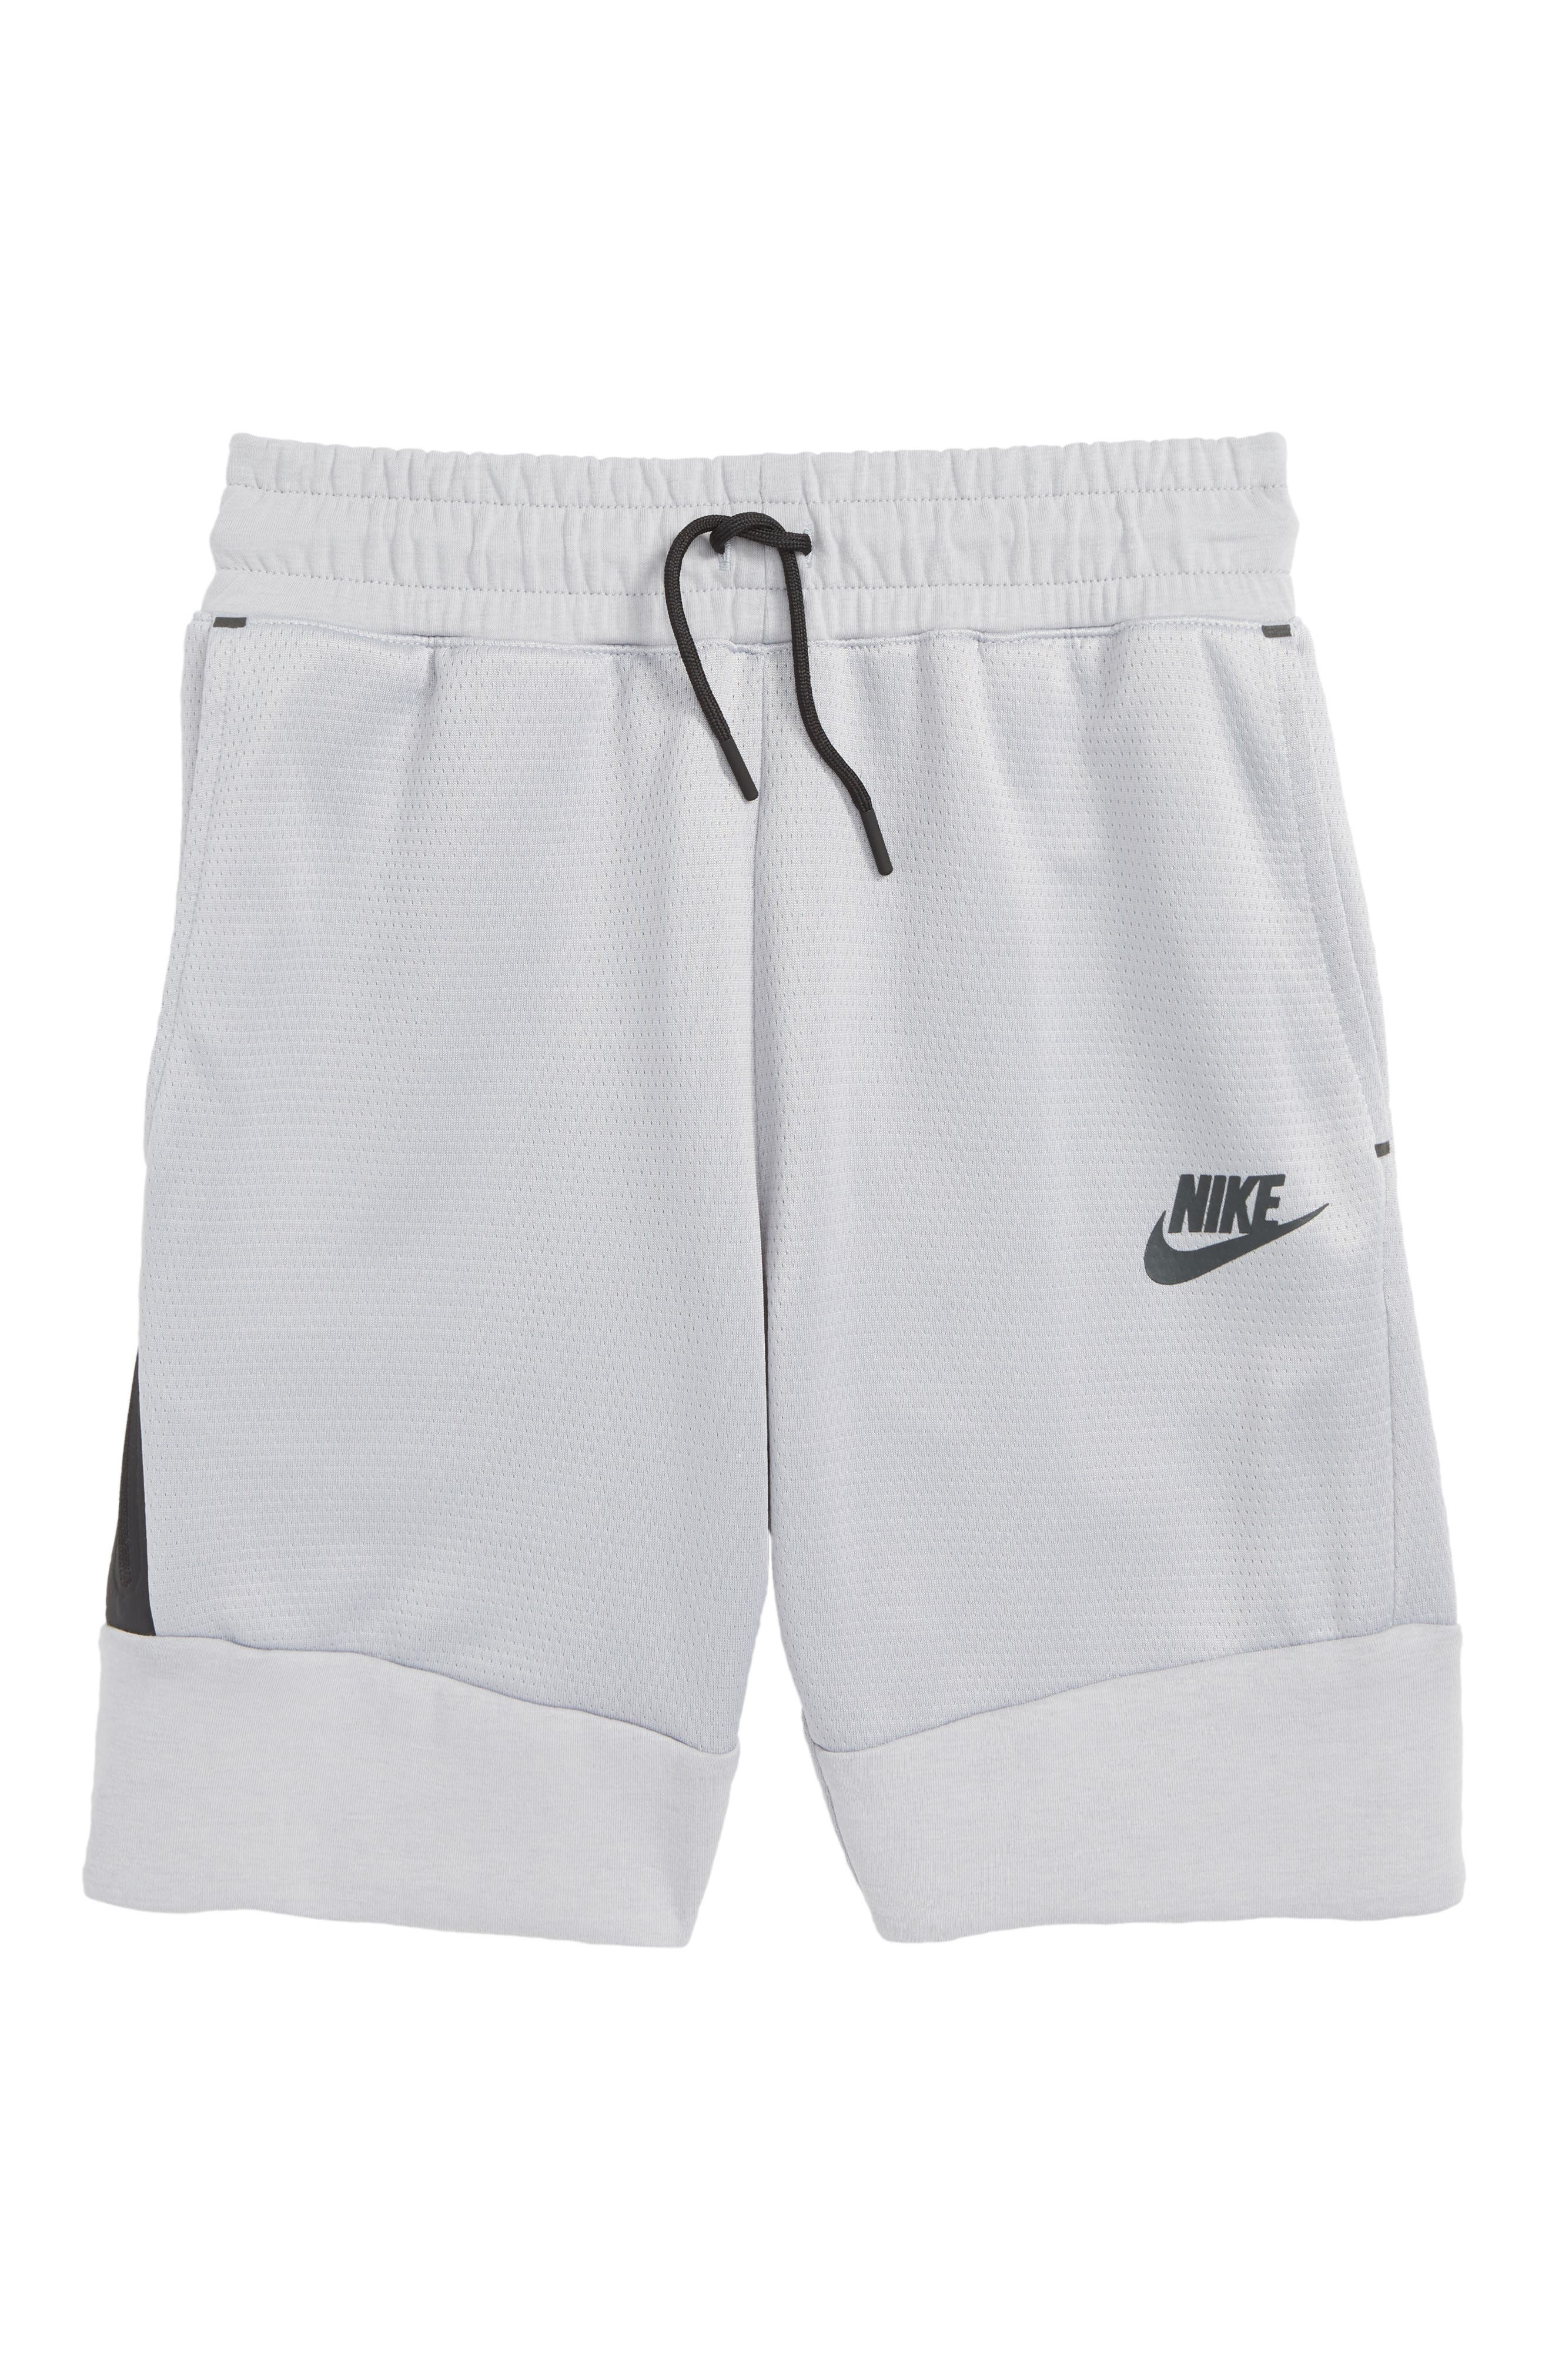 Sportswear Tech Fleece Shorts,                         Main,                         color, WOLF GREY/ ANTHRACITE